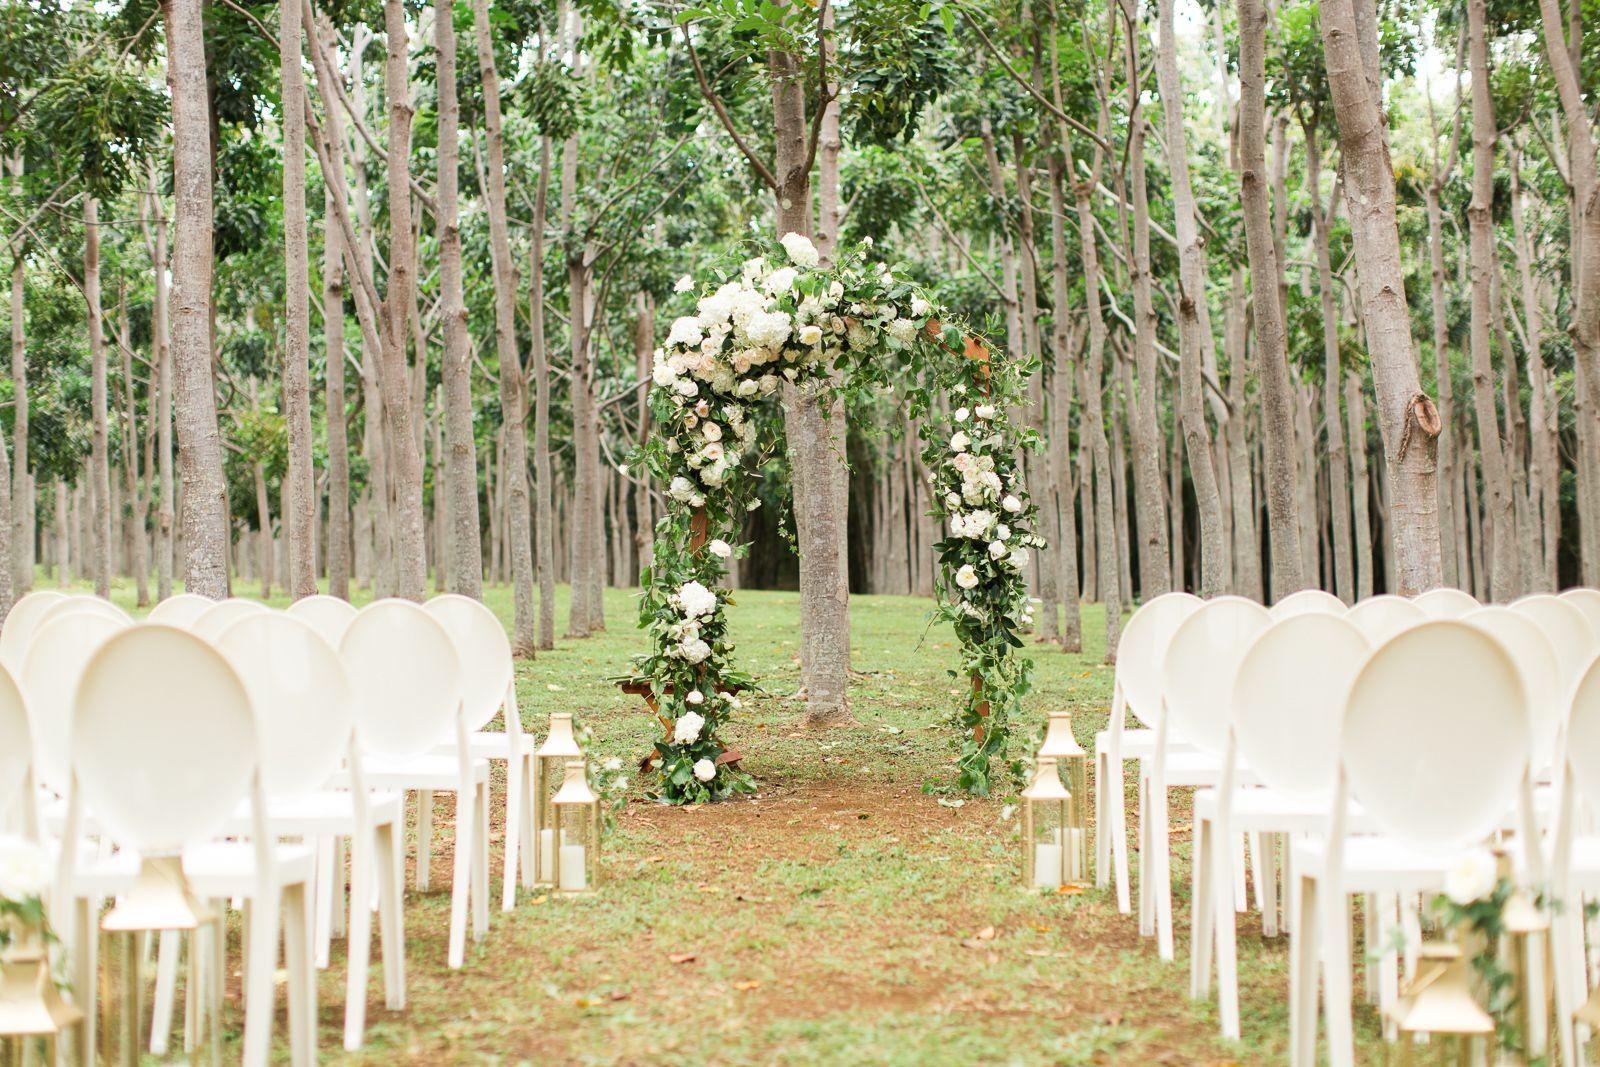 outdoor wedding ideas & 35 Outdoor Wedding Ideas - Decorations for a Fun Outside Spring Wedding